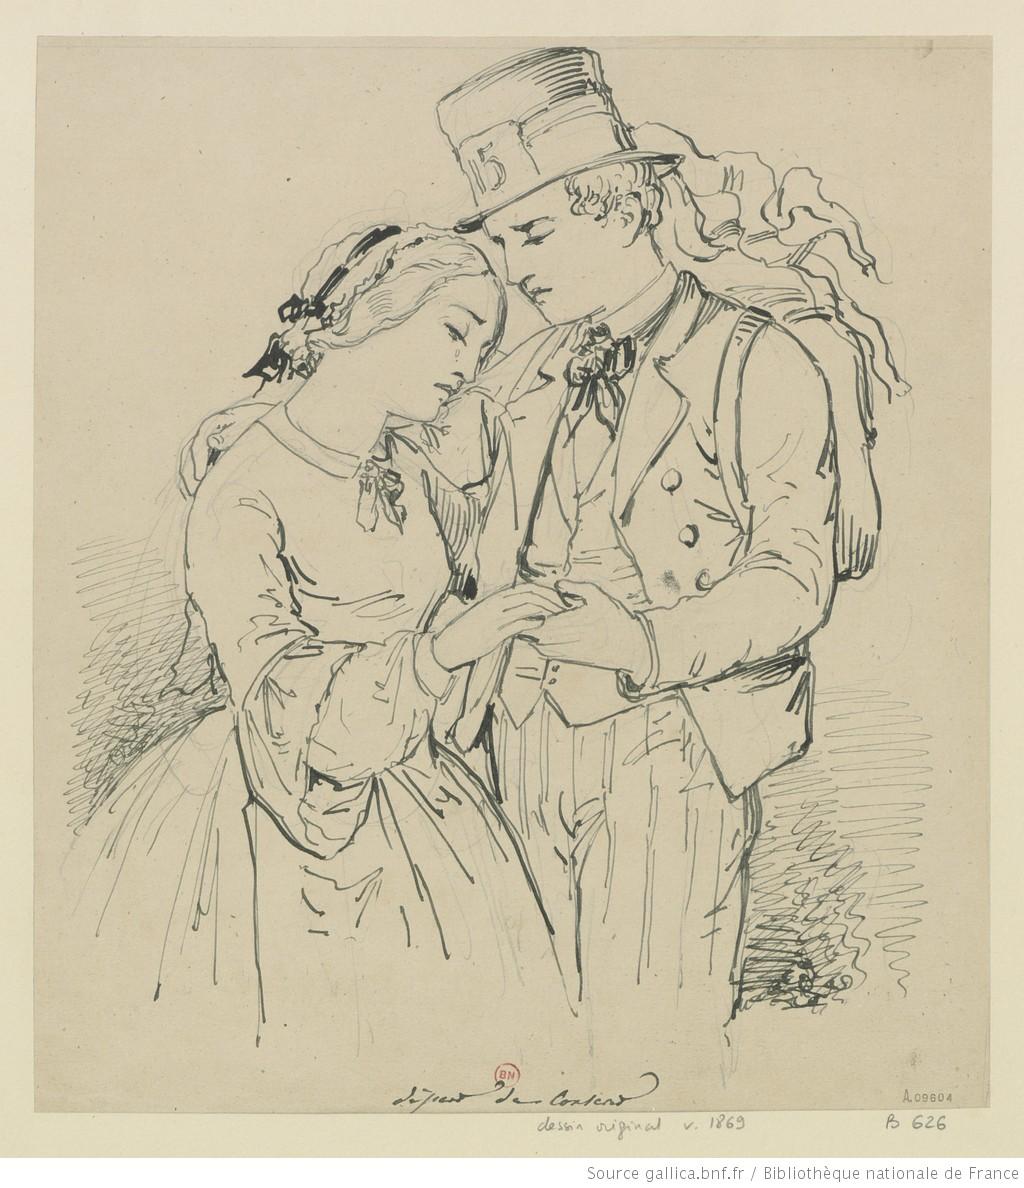 Pellerin 1869 Le_depart_du_conscrit dessin Gallica